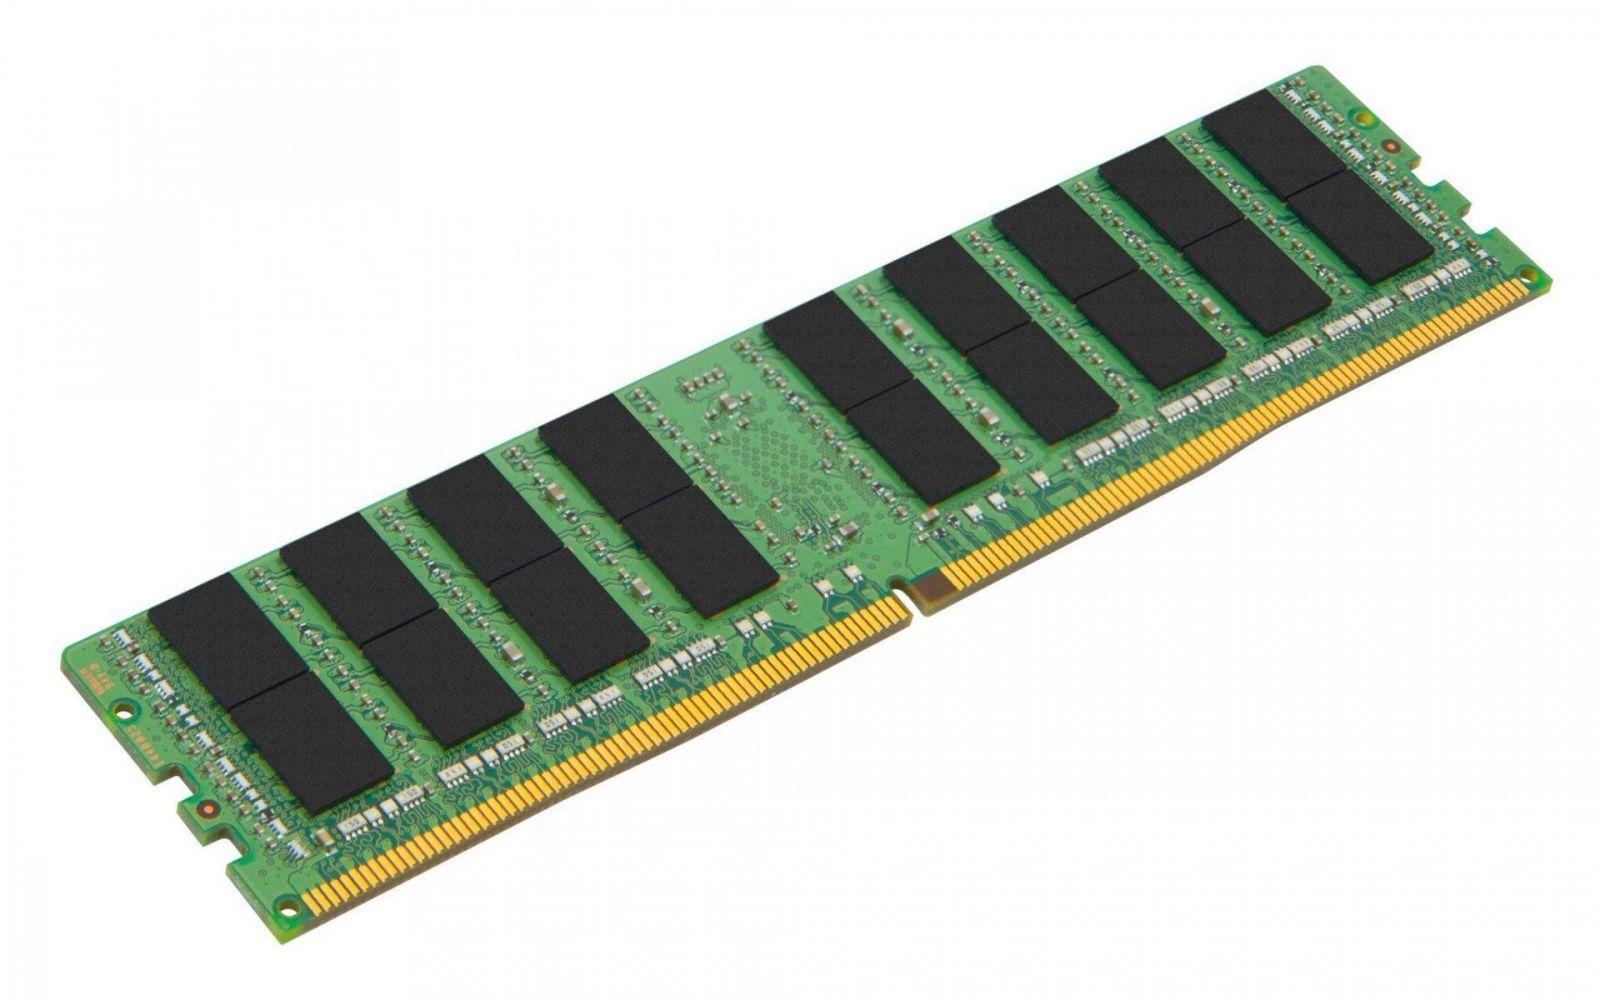 LRDIMM DDR4 ECC Registered DIMM 32GB - Модули регистровой памяти Kingston Server Premier DDR4 прошли валидацию для платформы Intel Purley